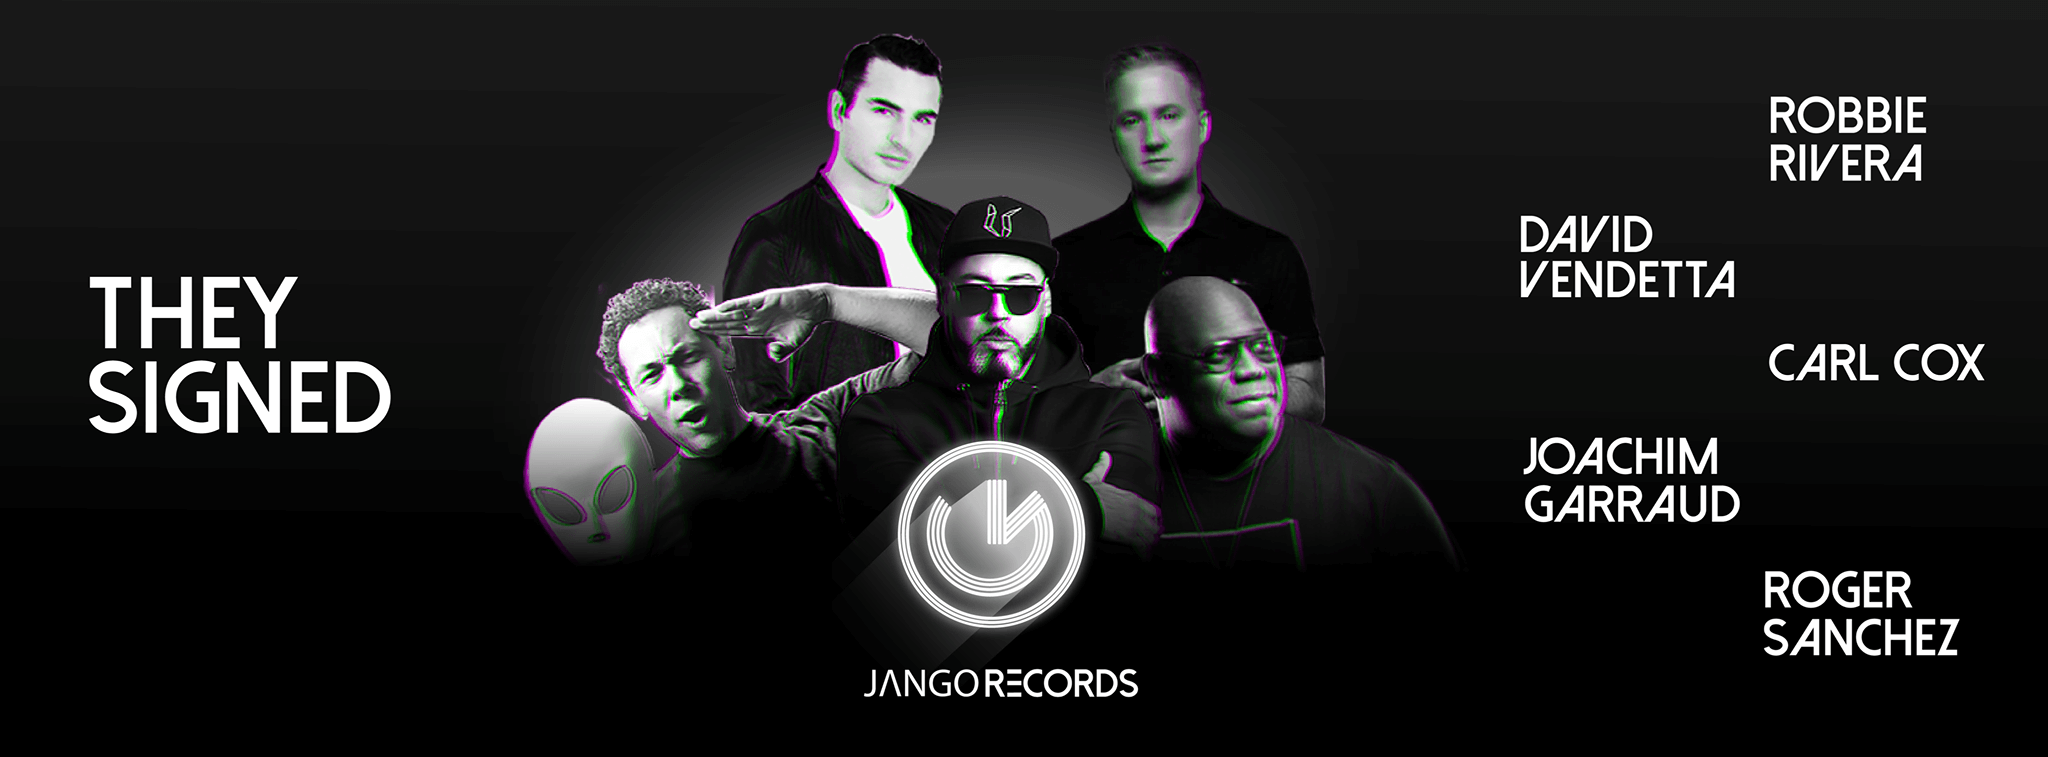 Robbie Rivera, David Vendetta, Carl Cox, Joachim Garraud, Roger Sanchez signed on Jango Records.